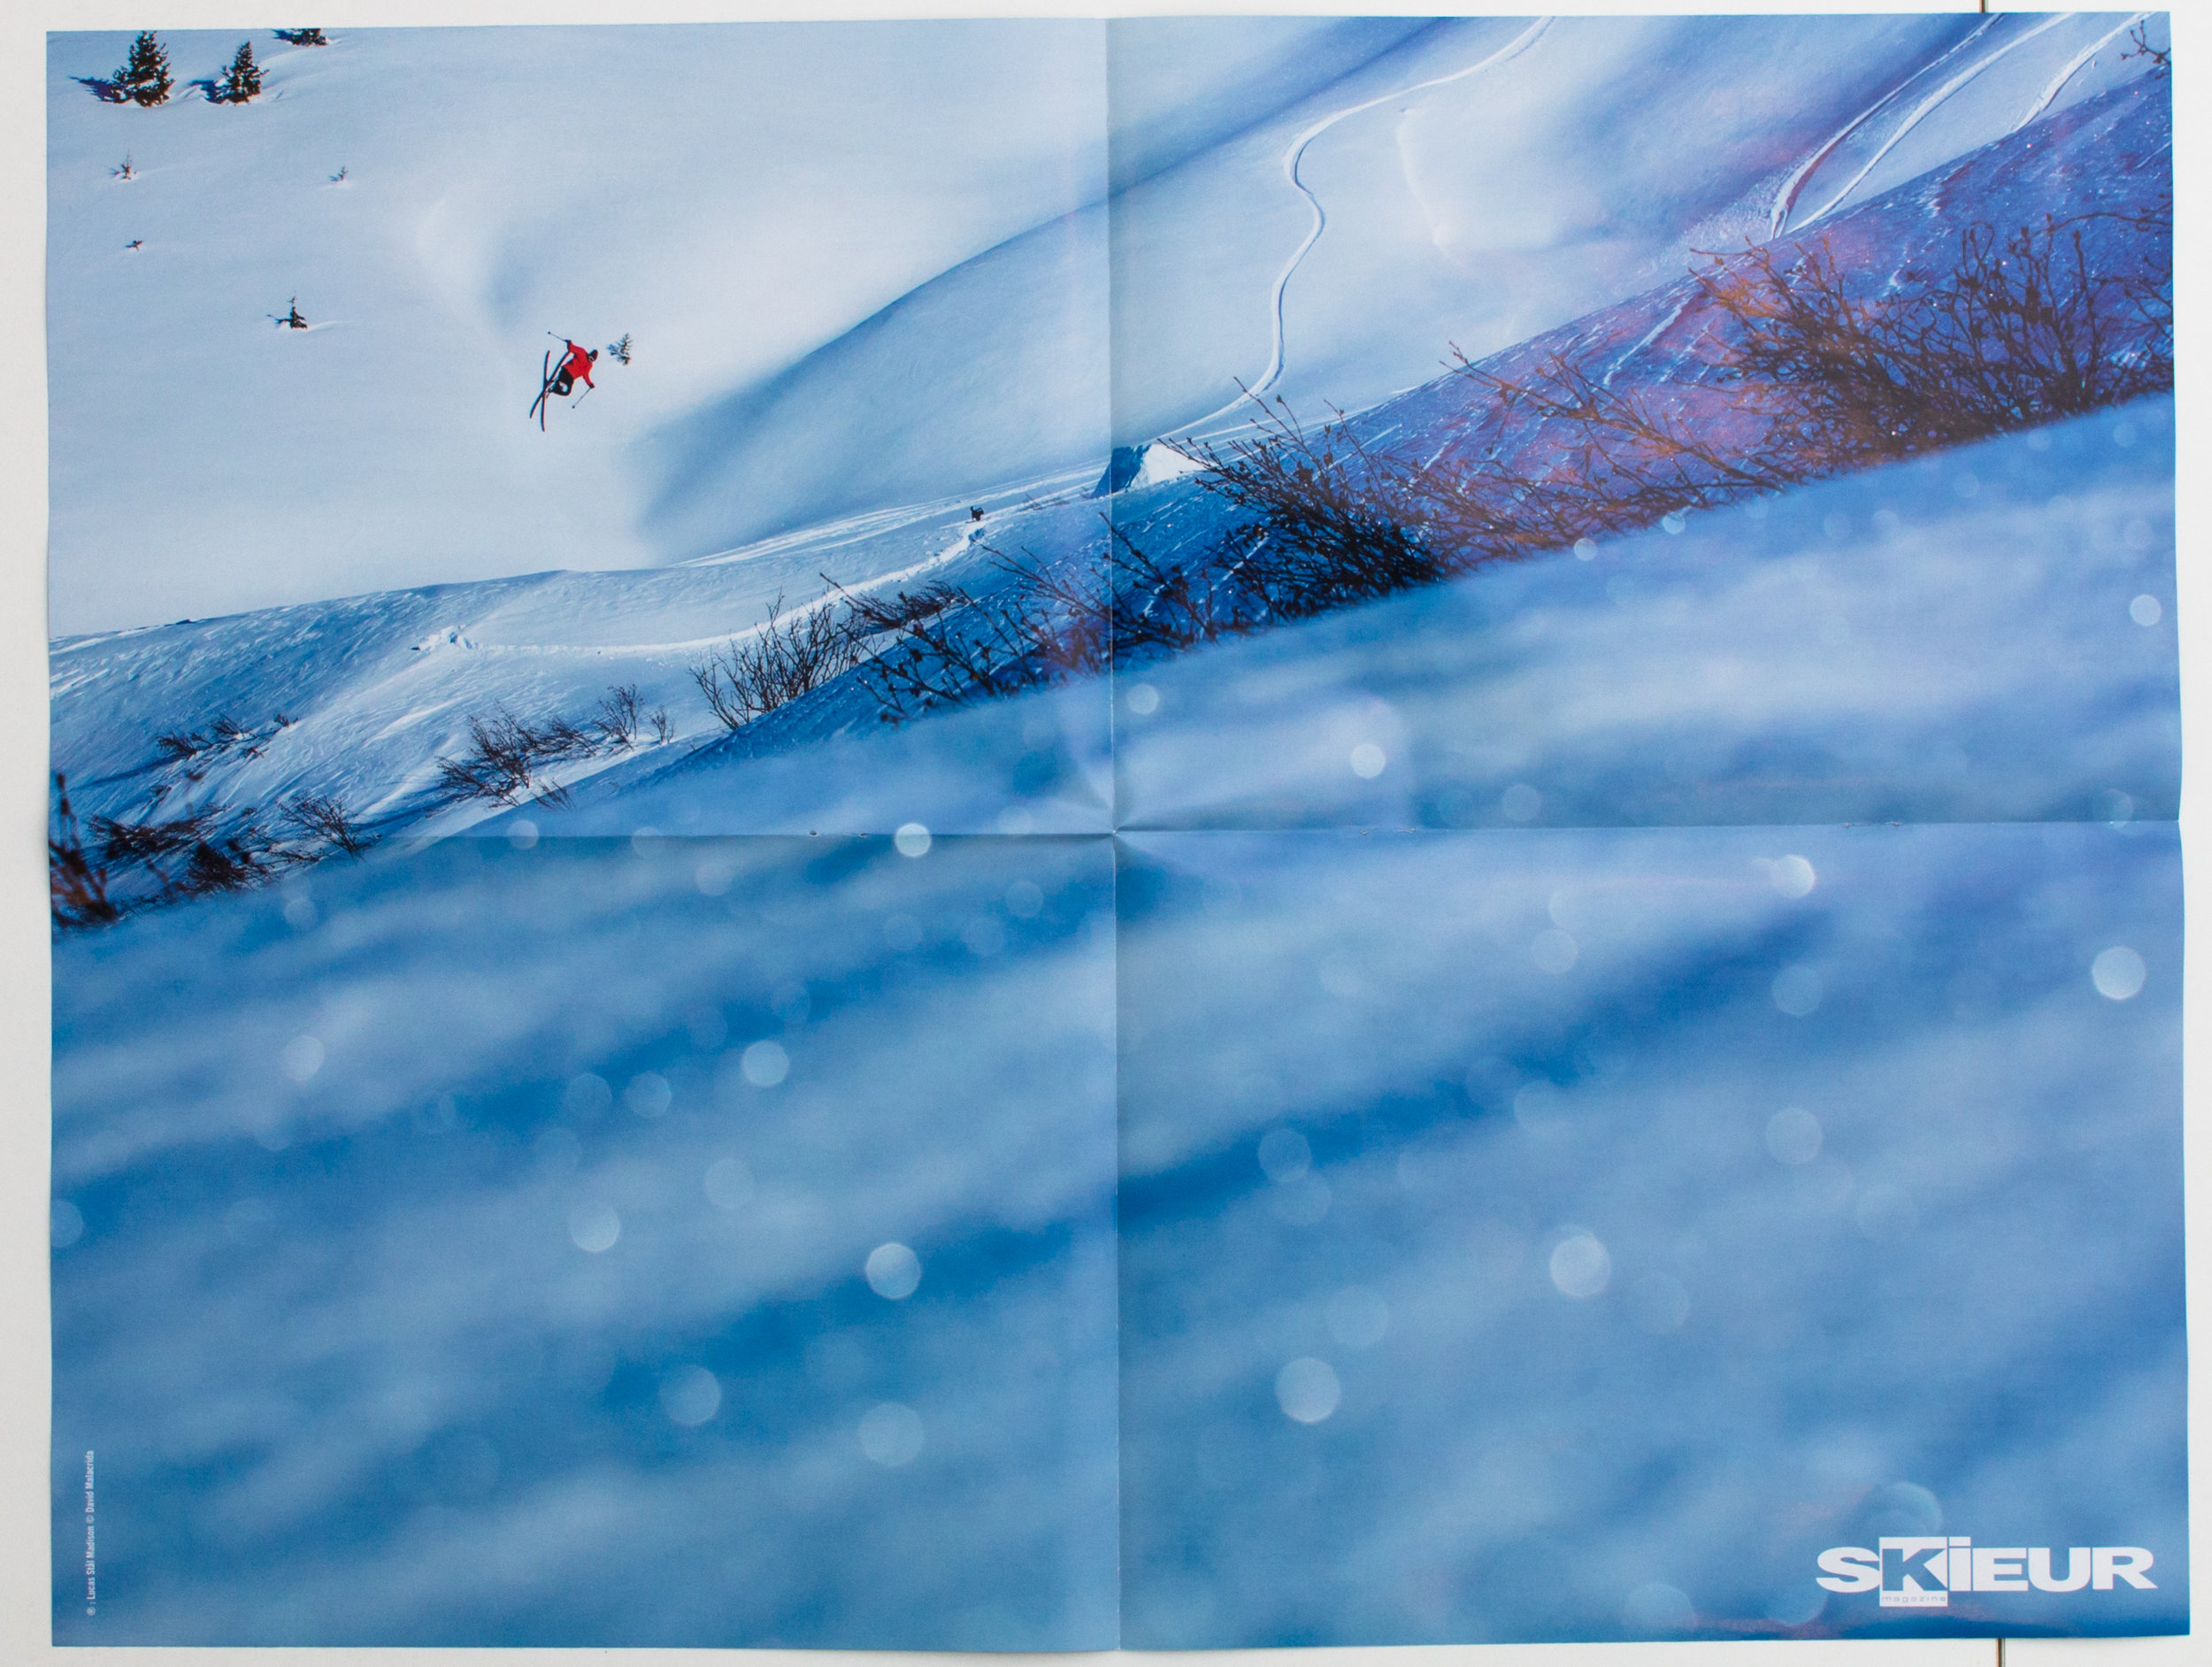 Skieur dub page David Malacrida Poster.jpg